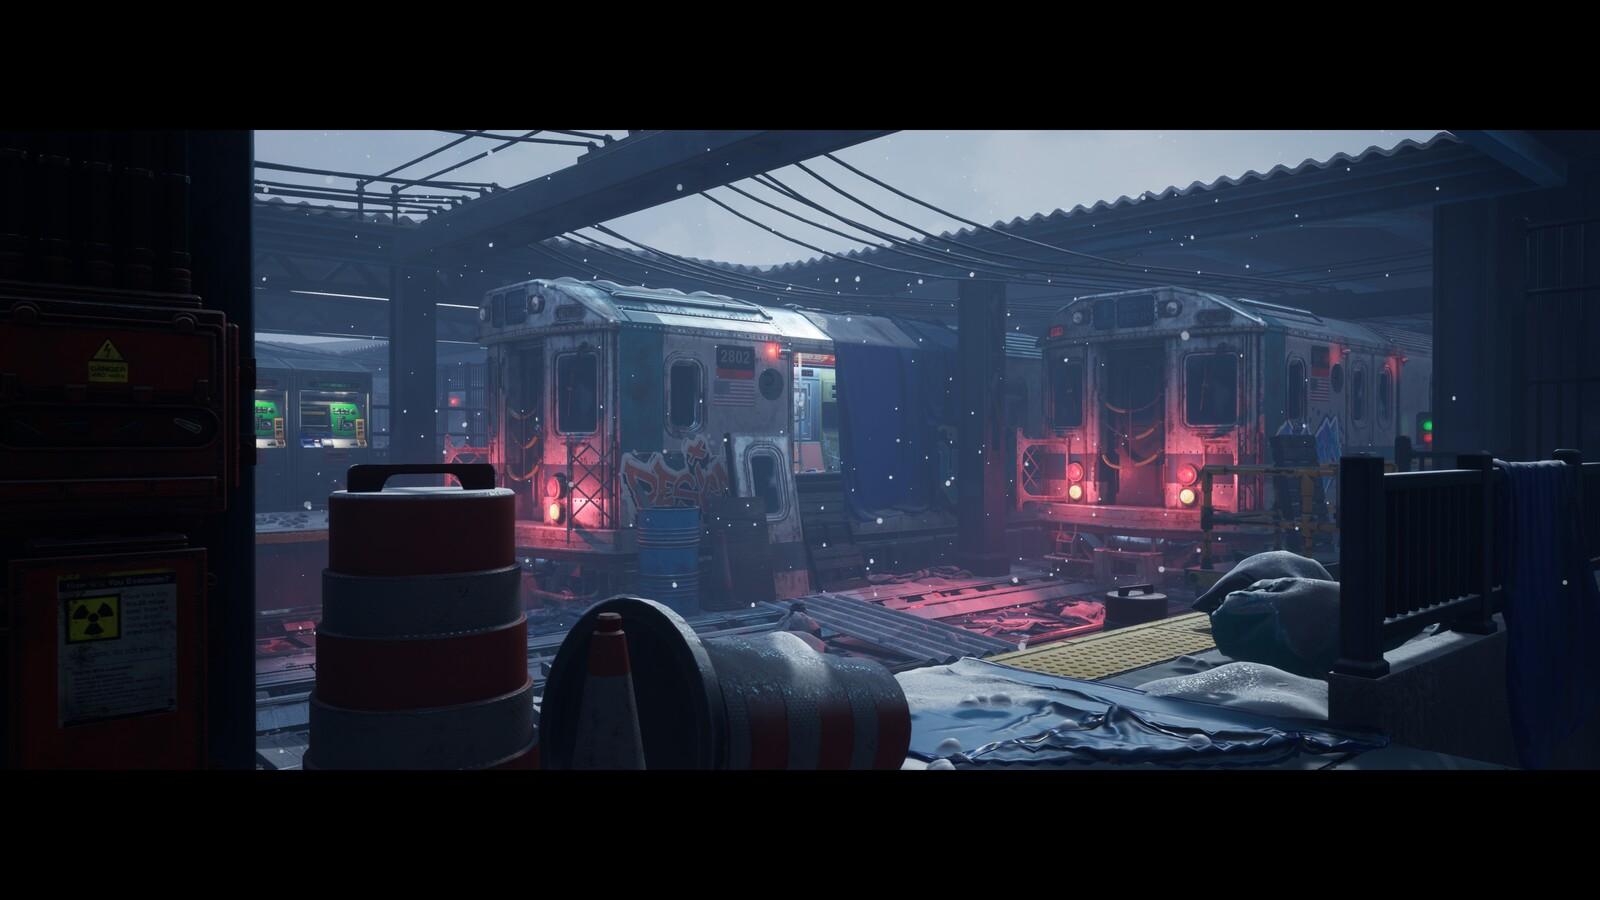 New York Train Station 2049- Exterior